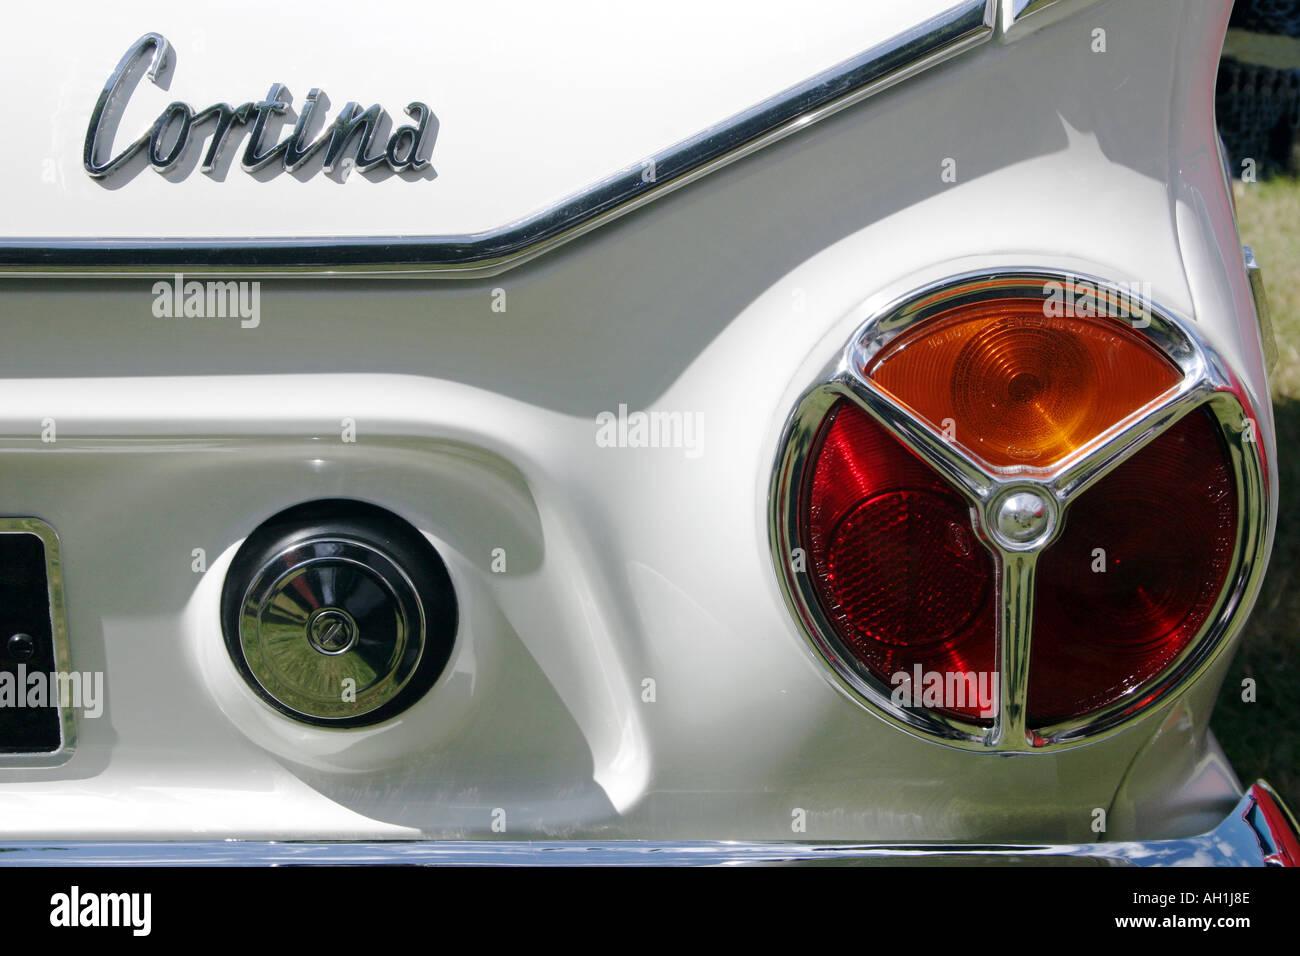 Ford Cortina Mark 1 ban the bomb tail light Stock Photo